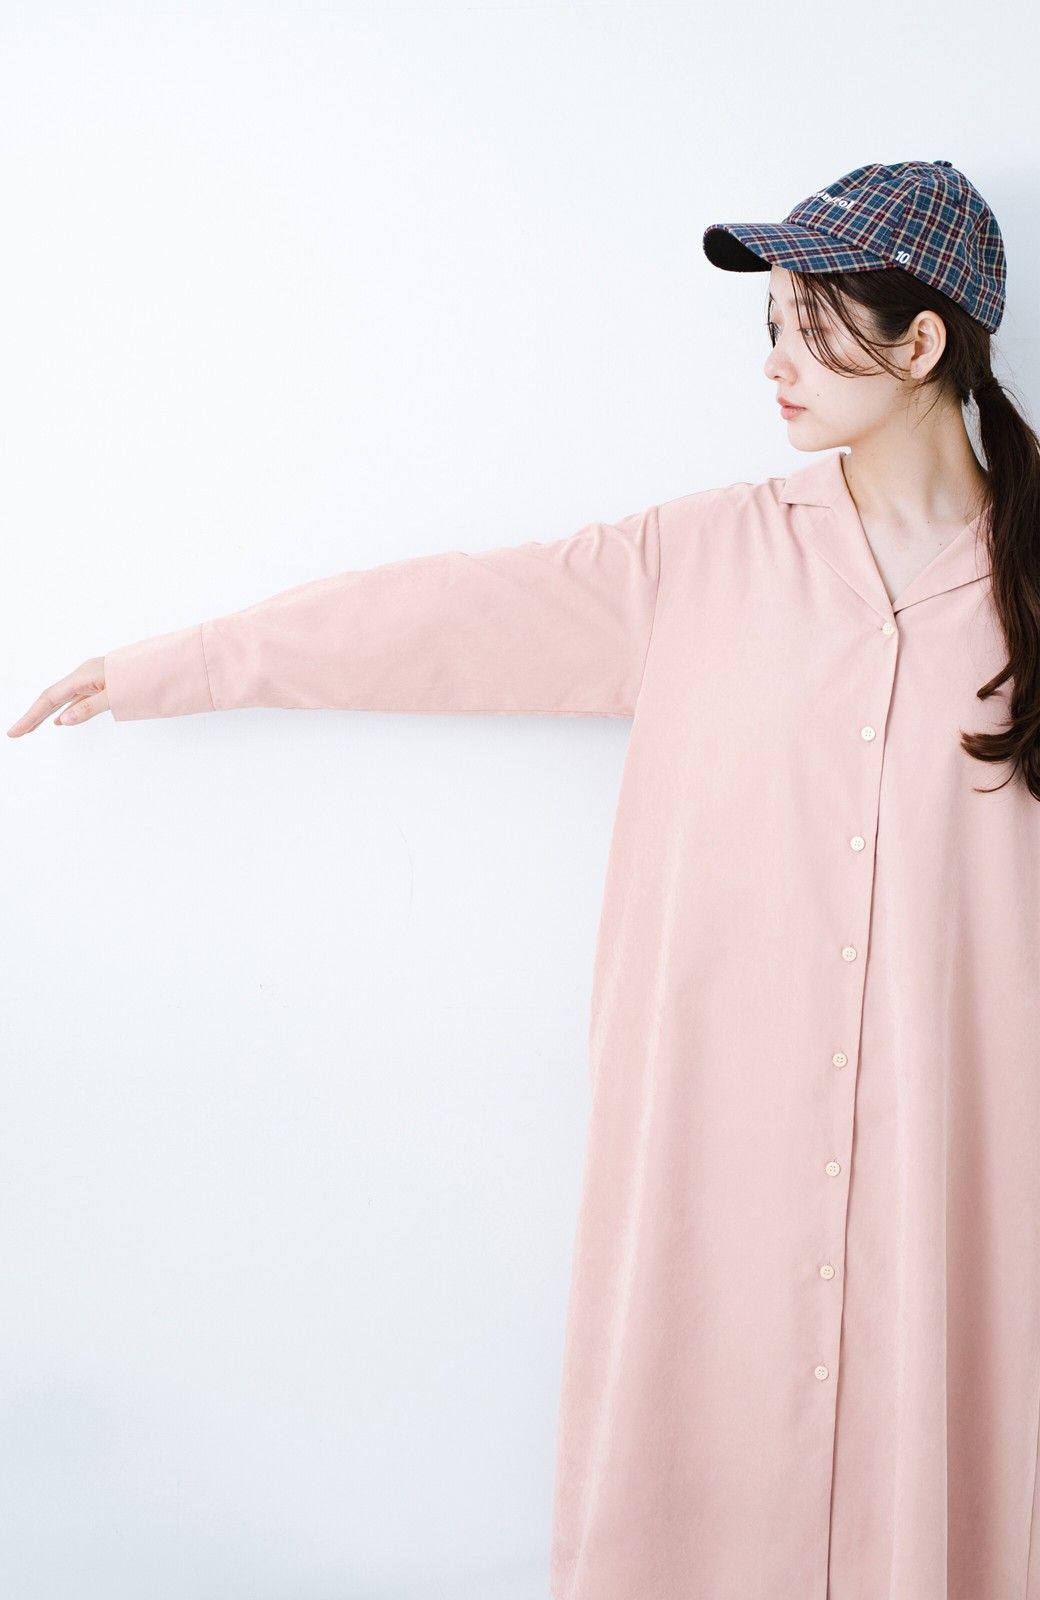 haco! 太ってもばれずに羽織っても便利なAラインワンピース <ピンク>の商品写真18